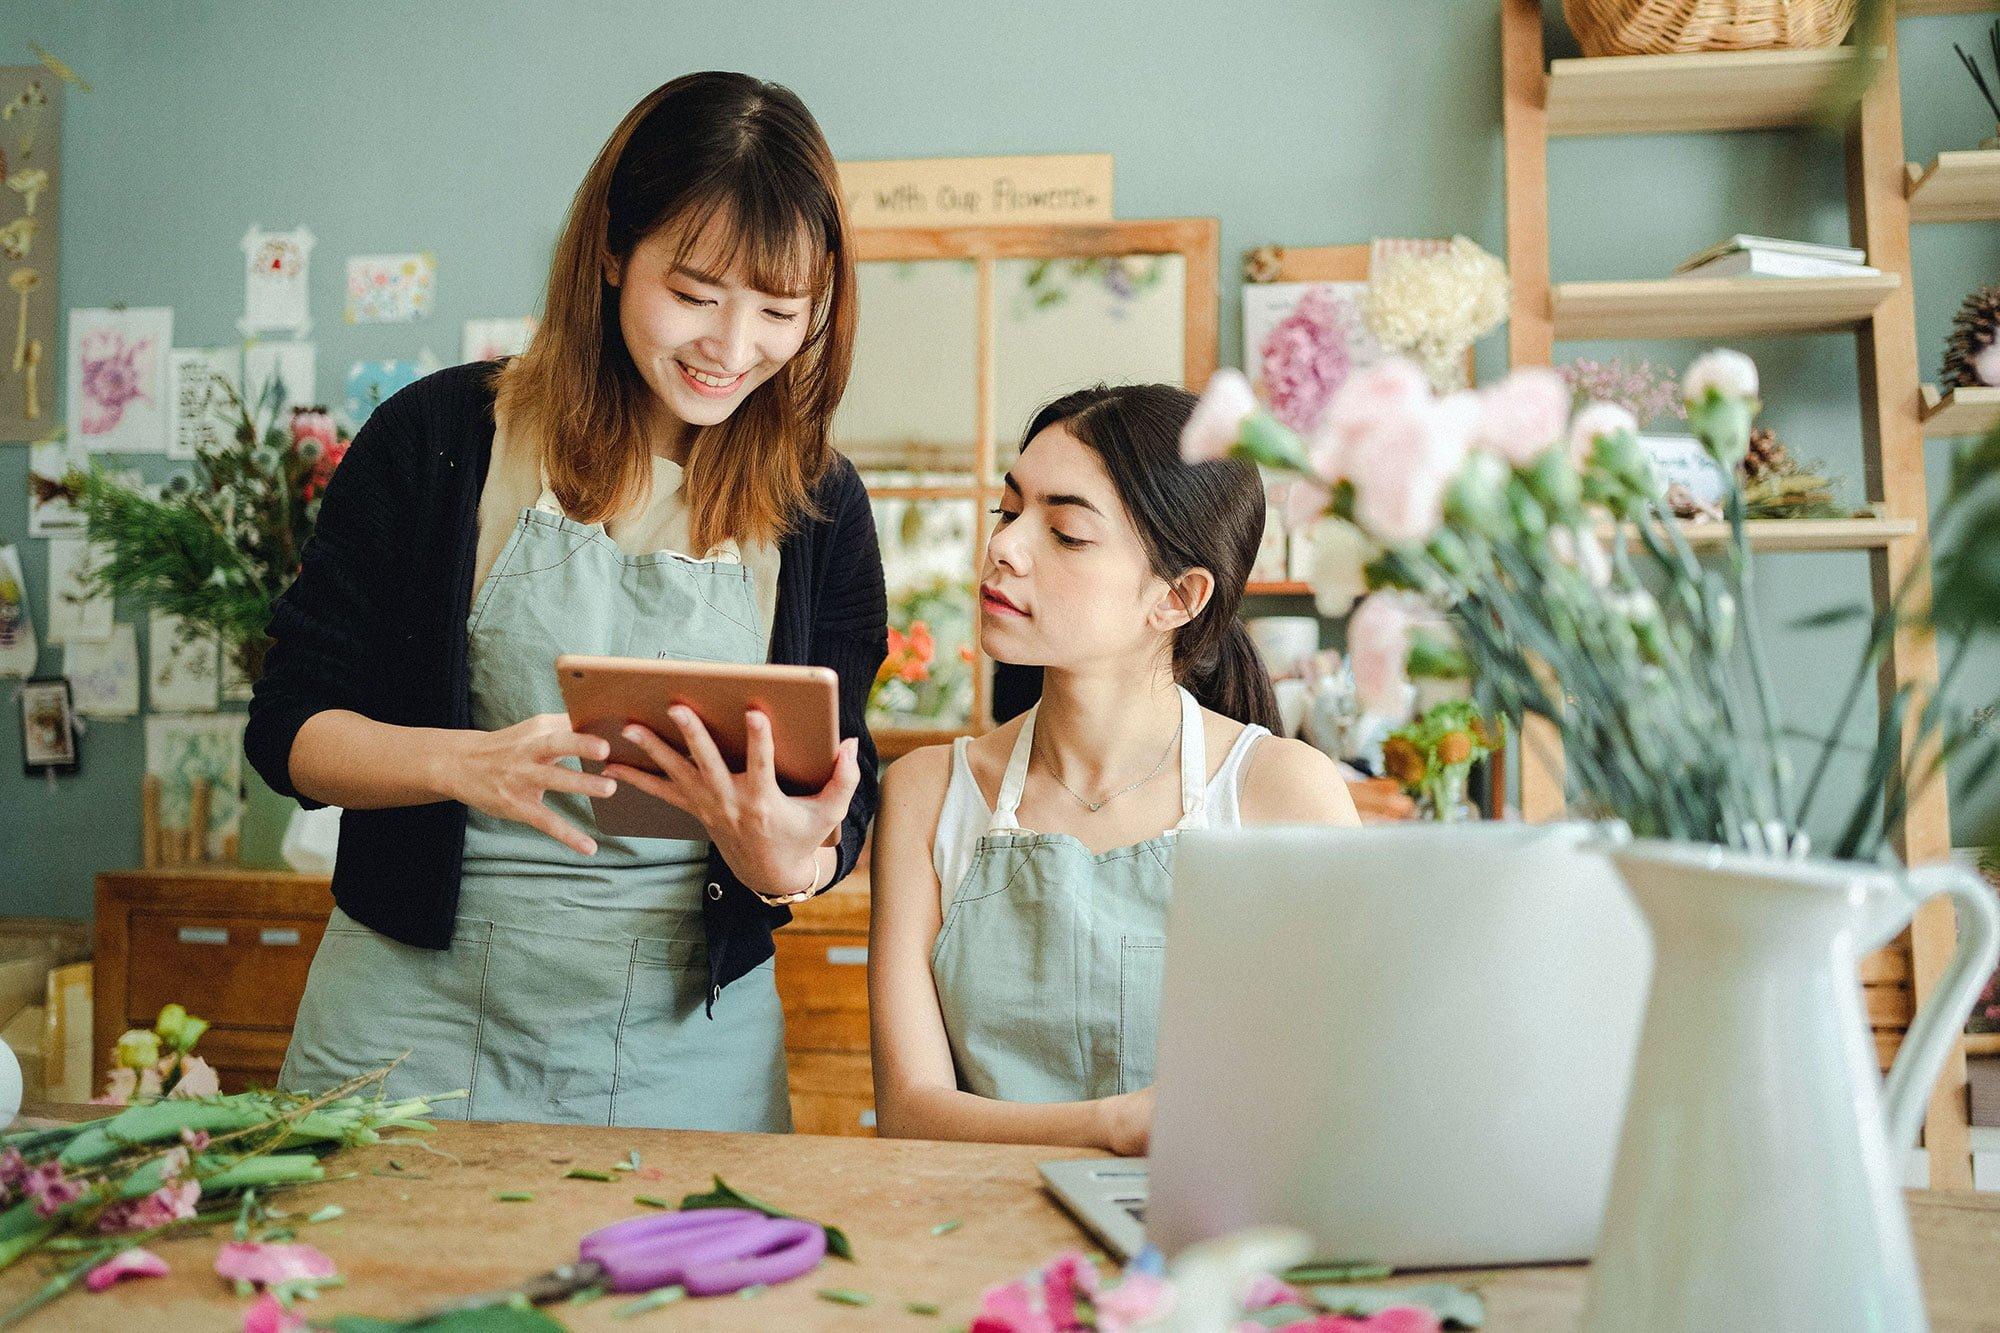 Browsing online florist